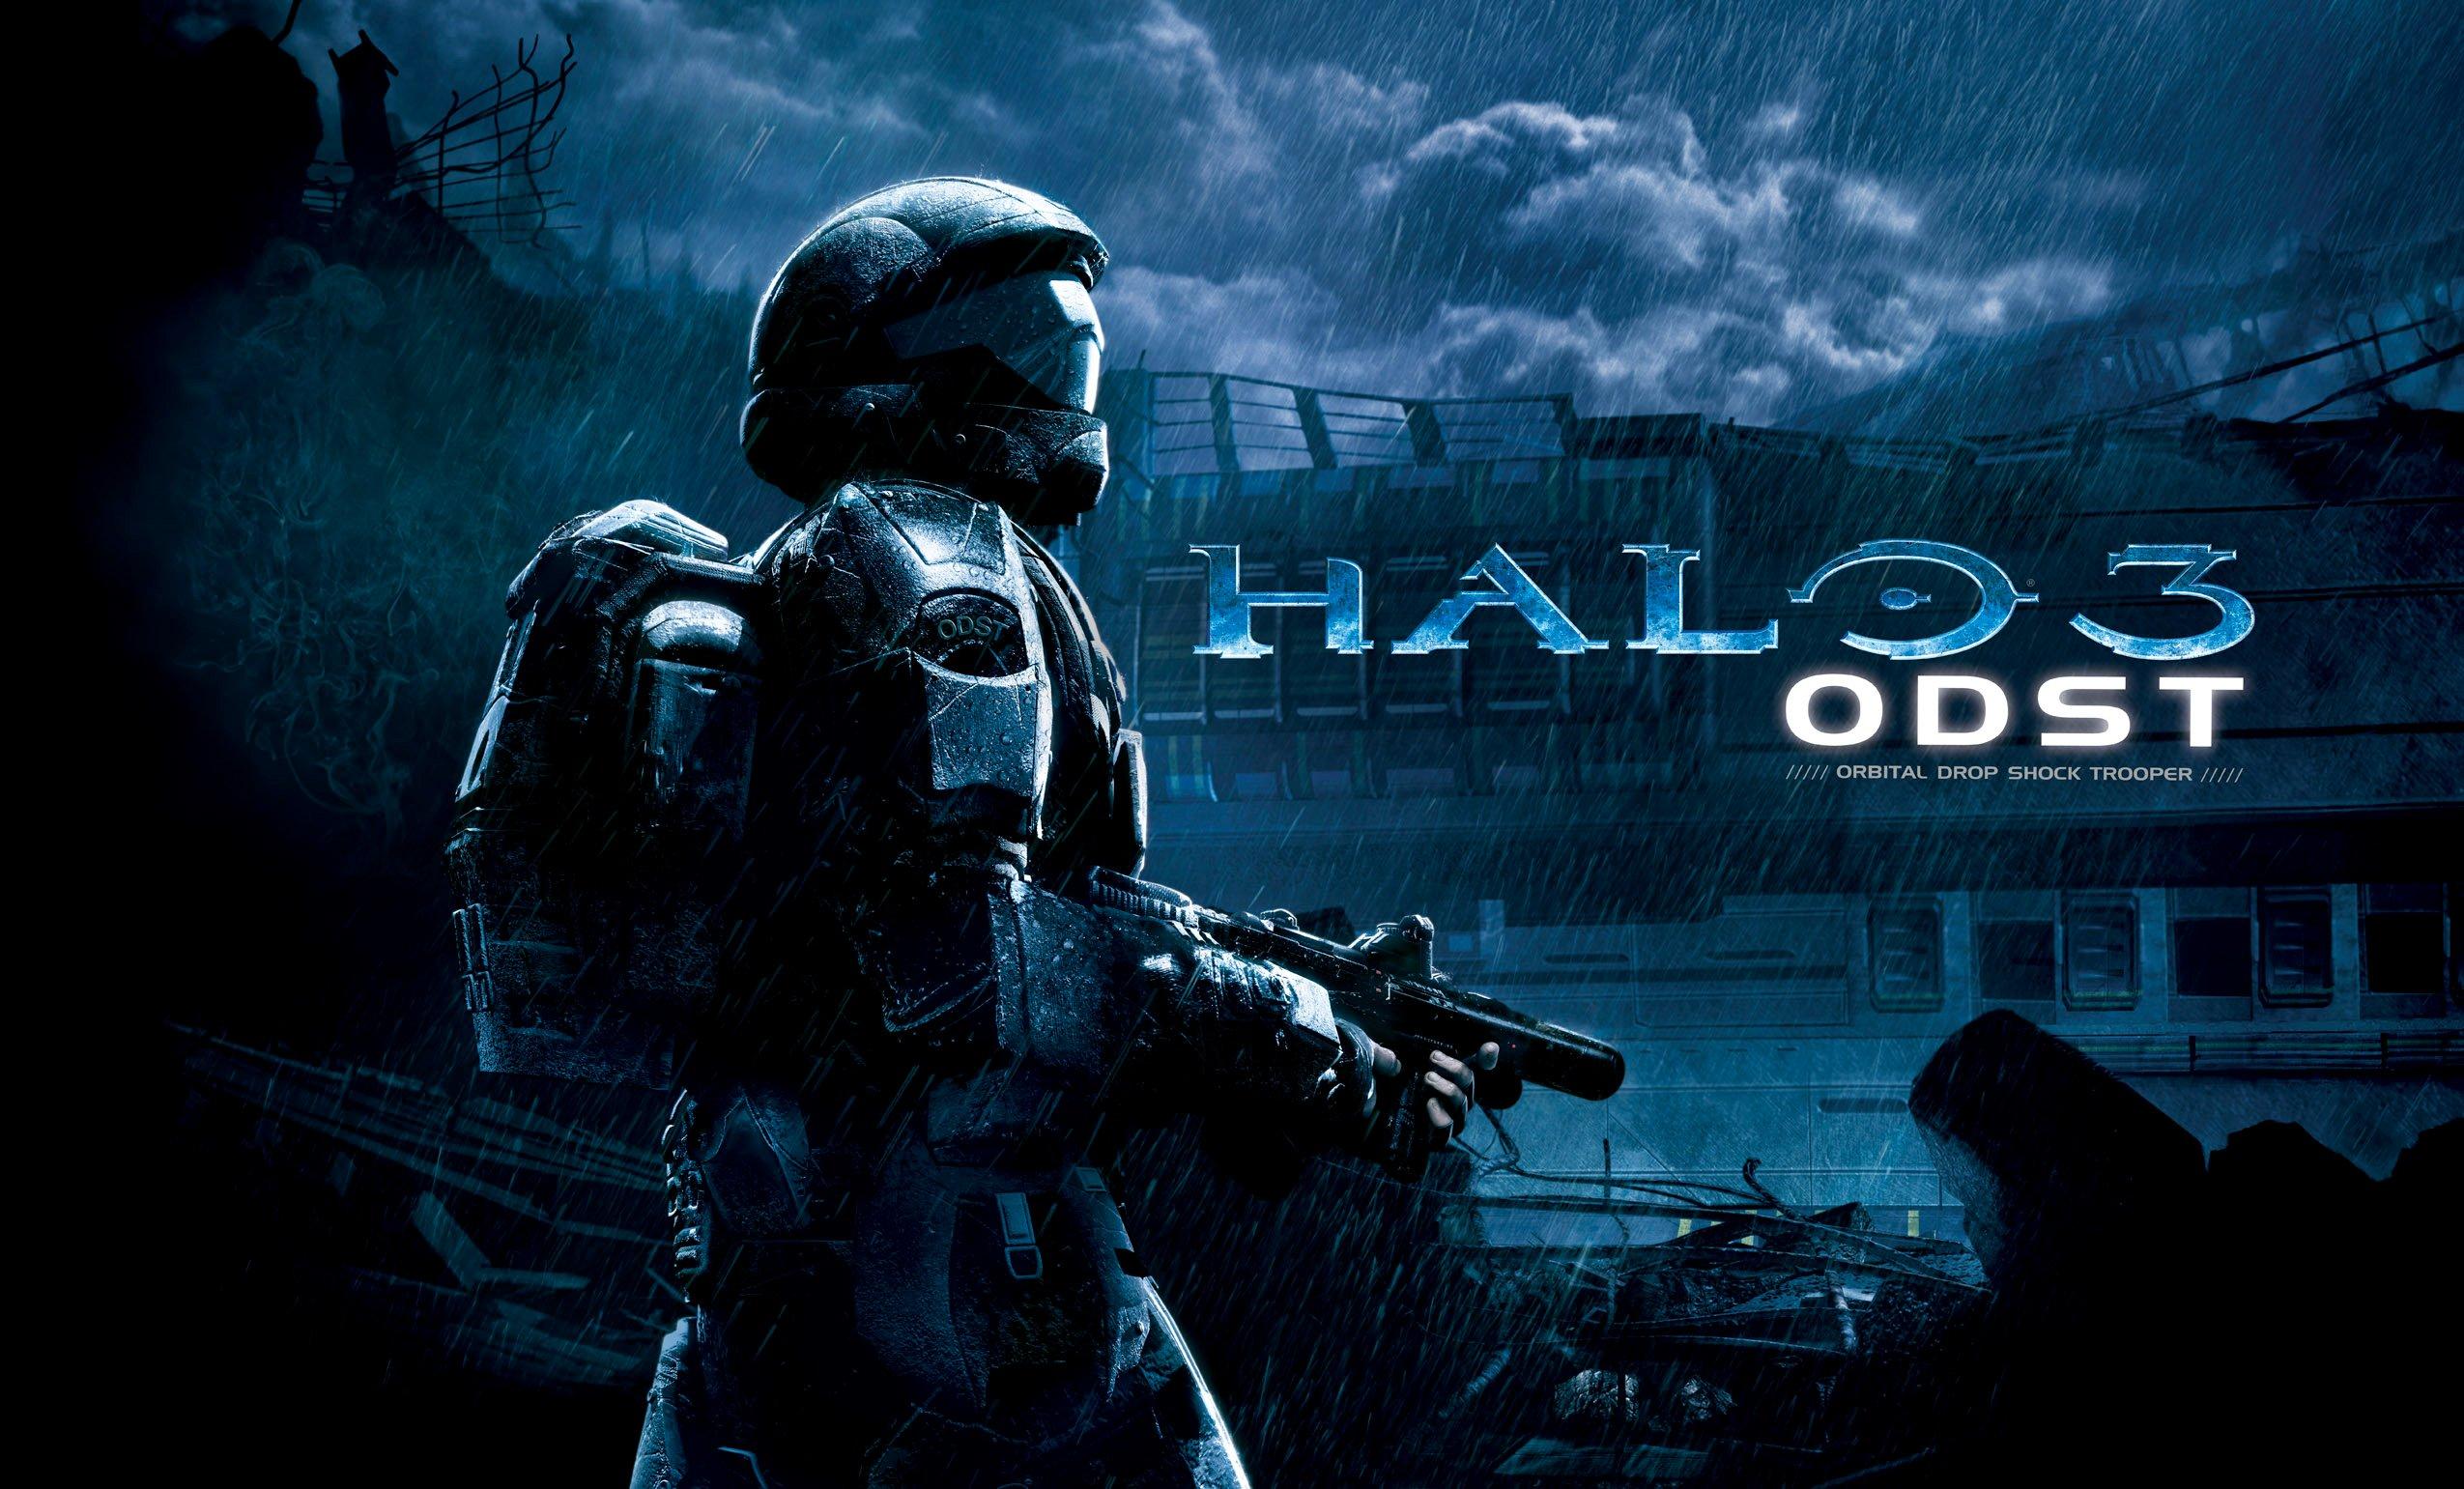 Fondos de pantalla Halo 3 ODST Orbital Drop Shock Troopers